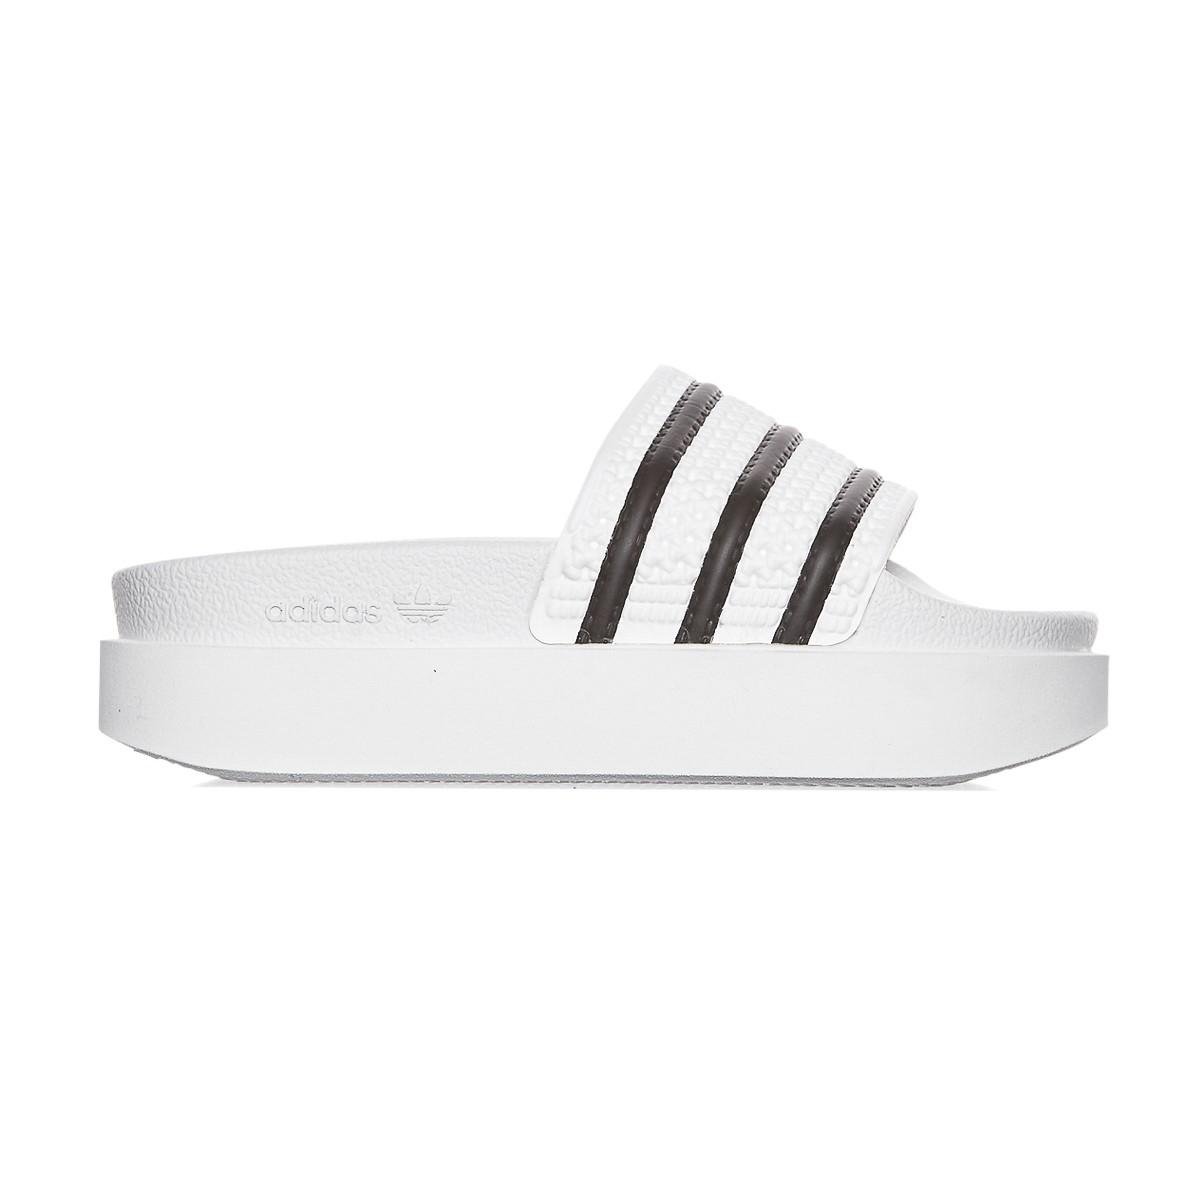 7c2602b567d Lyst - adidas Originals Adilette Bold Slide Sandals in Black